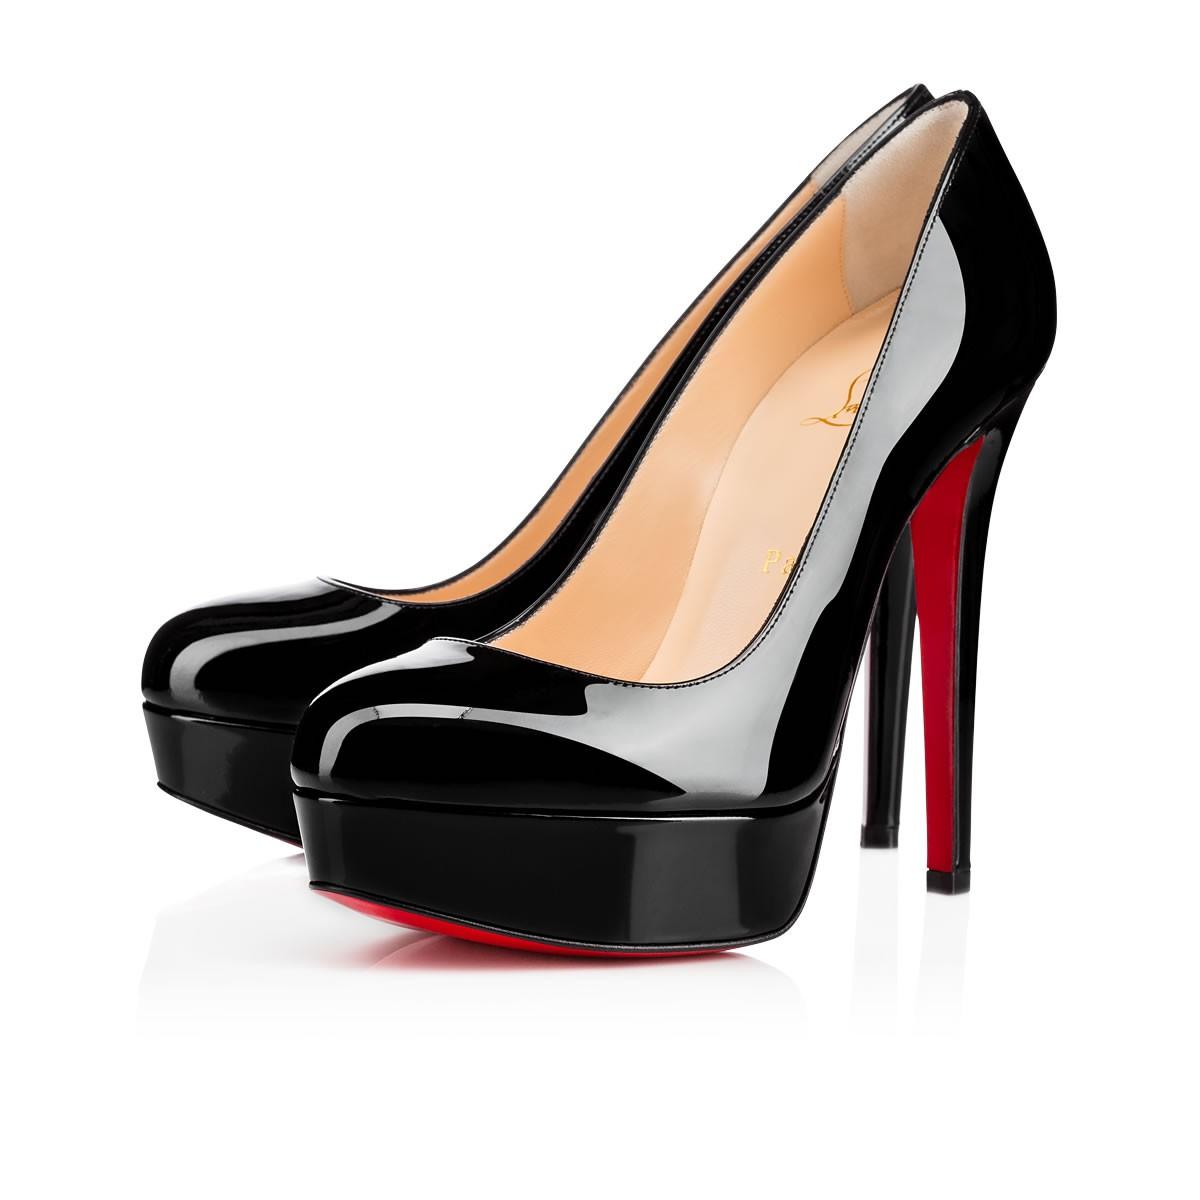 christian louboutin platform shoes